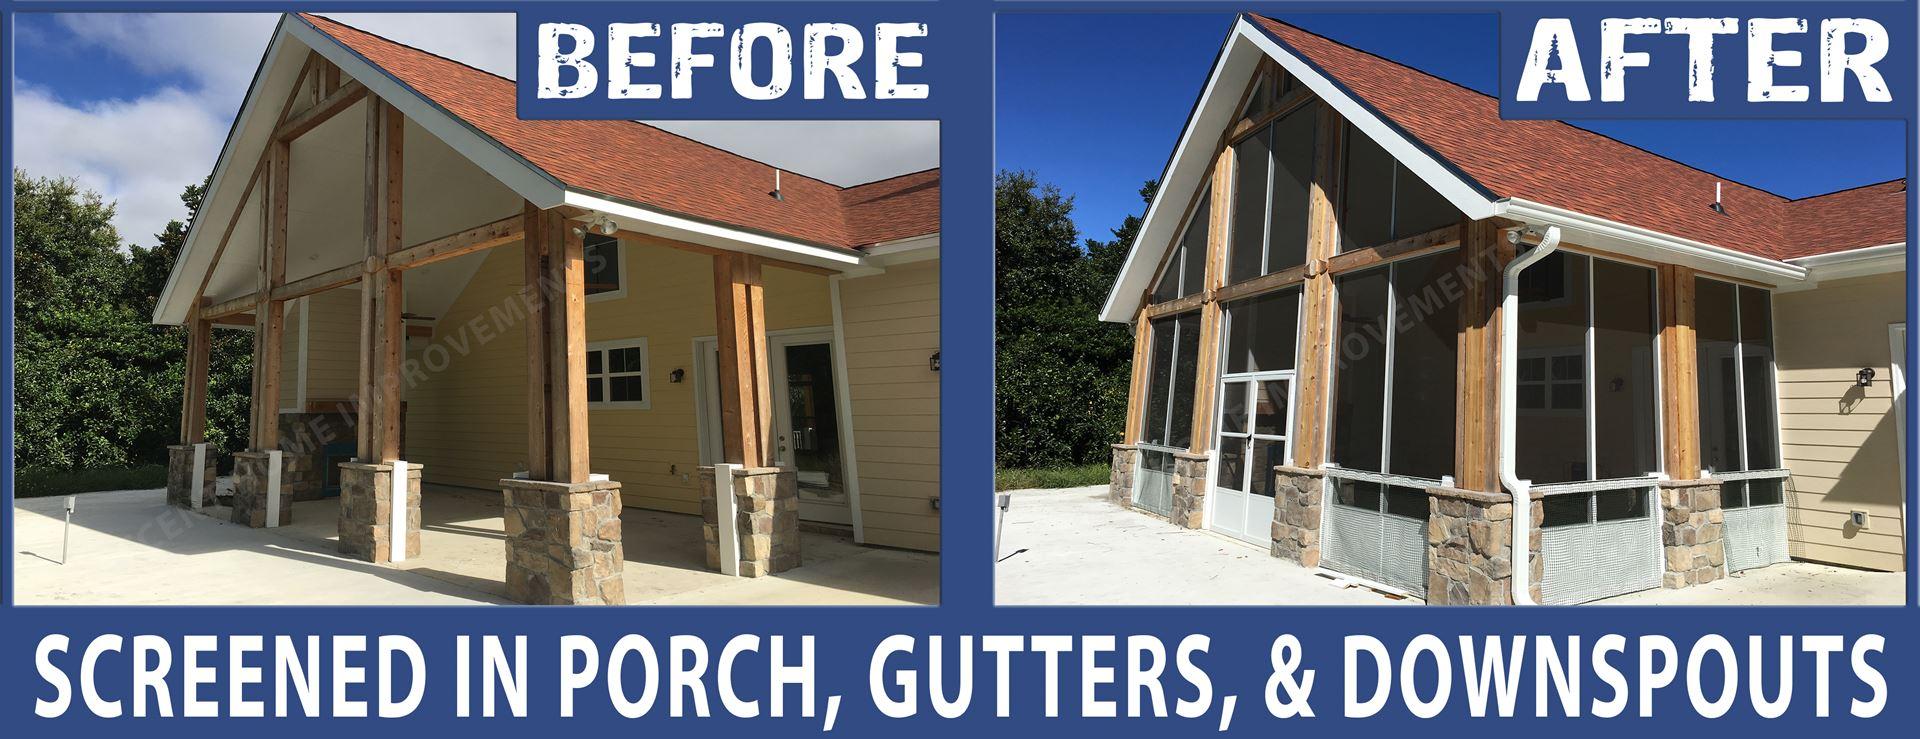 Exterior Home Improvement Contractors New Orleans Metairie